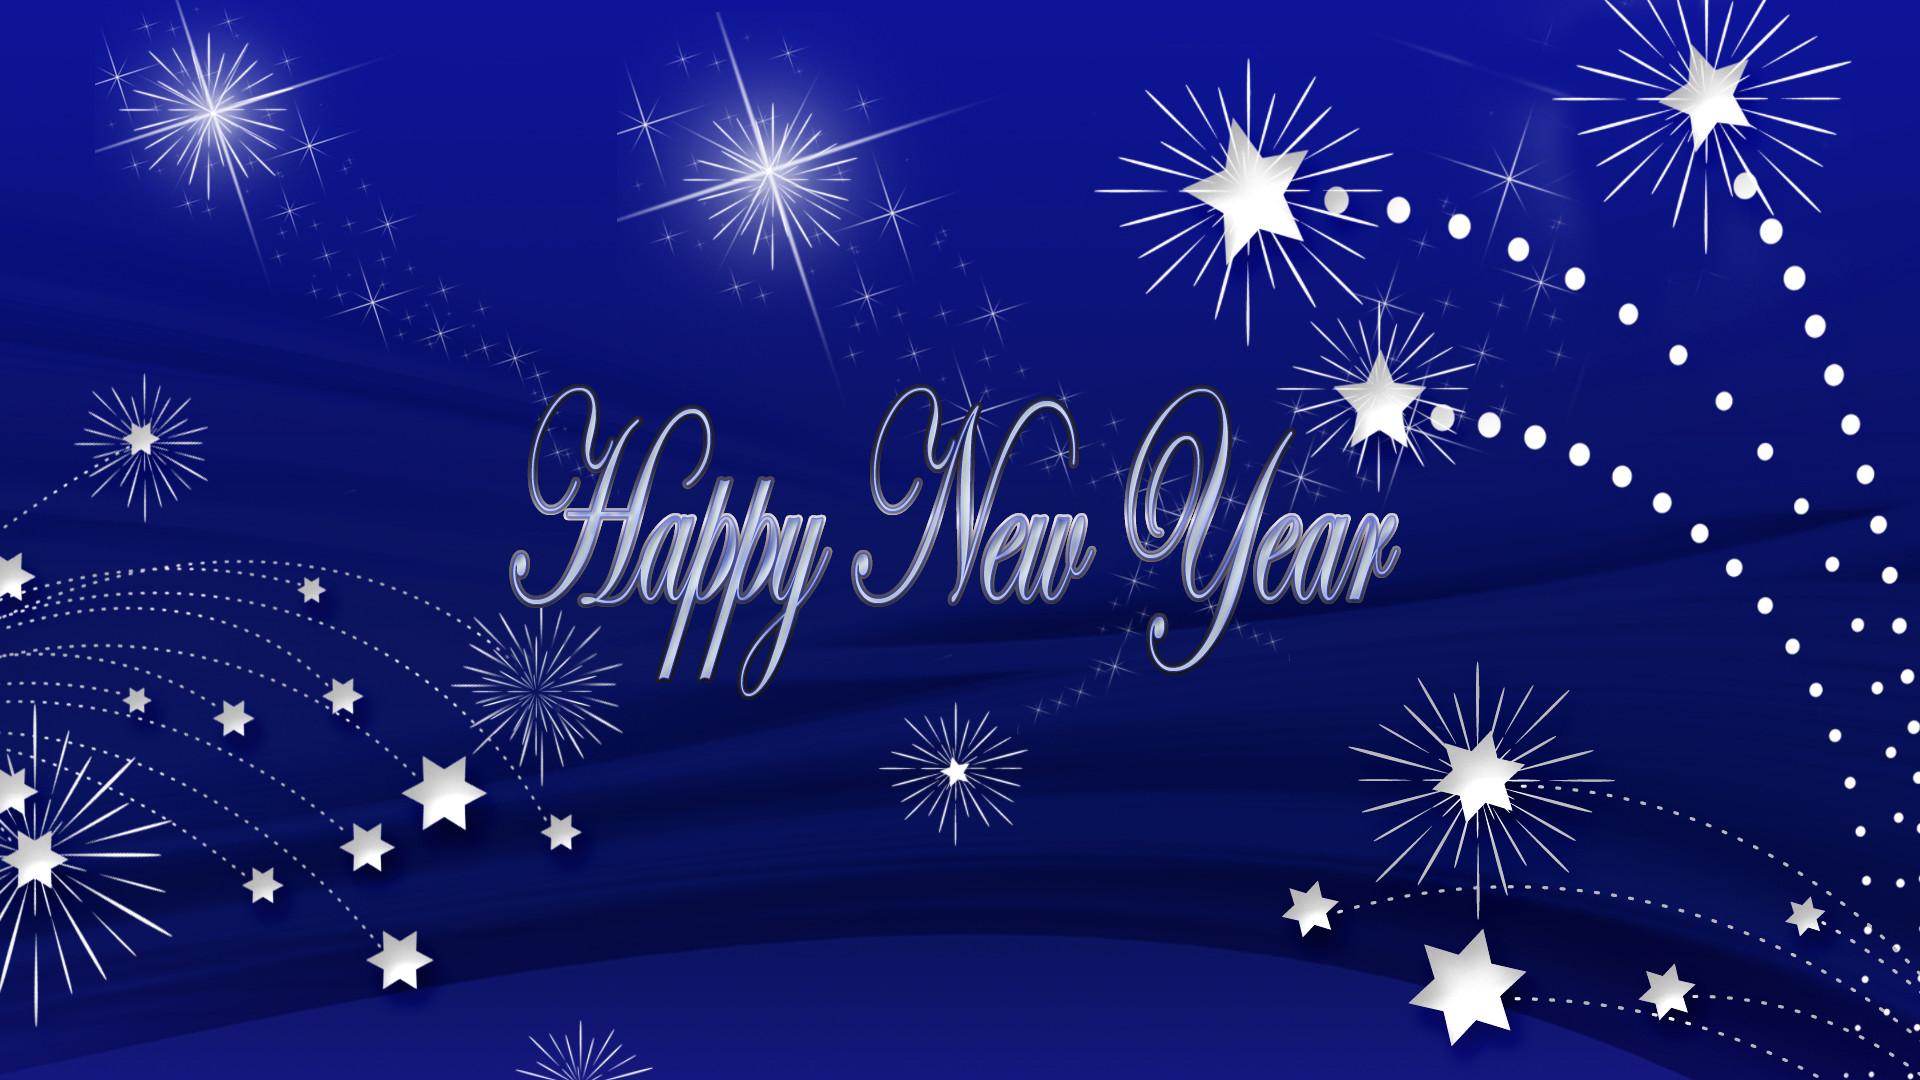 New Year Wallpapers for Desktop, Widescreen, Mobile, High New Year Images  Wallpapers Wallpapers)